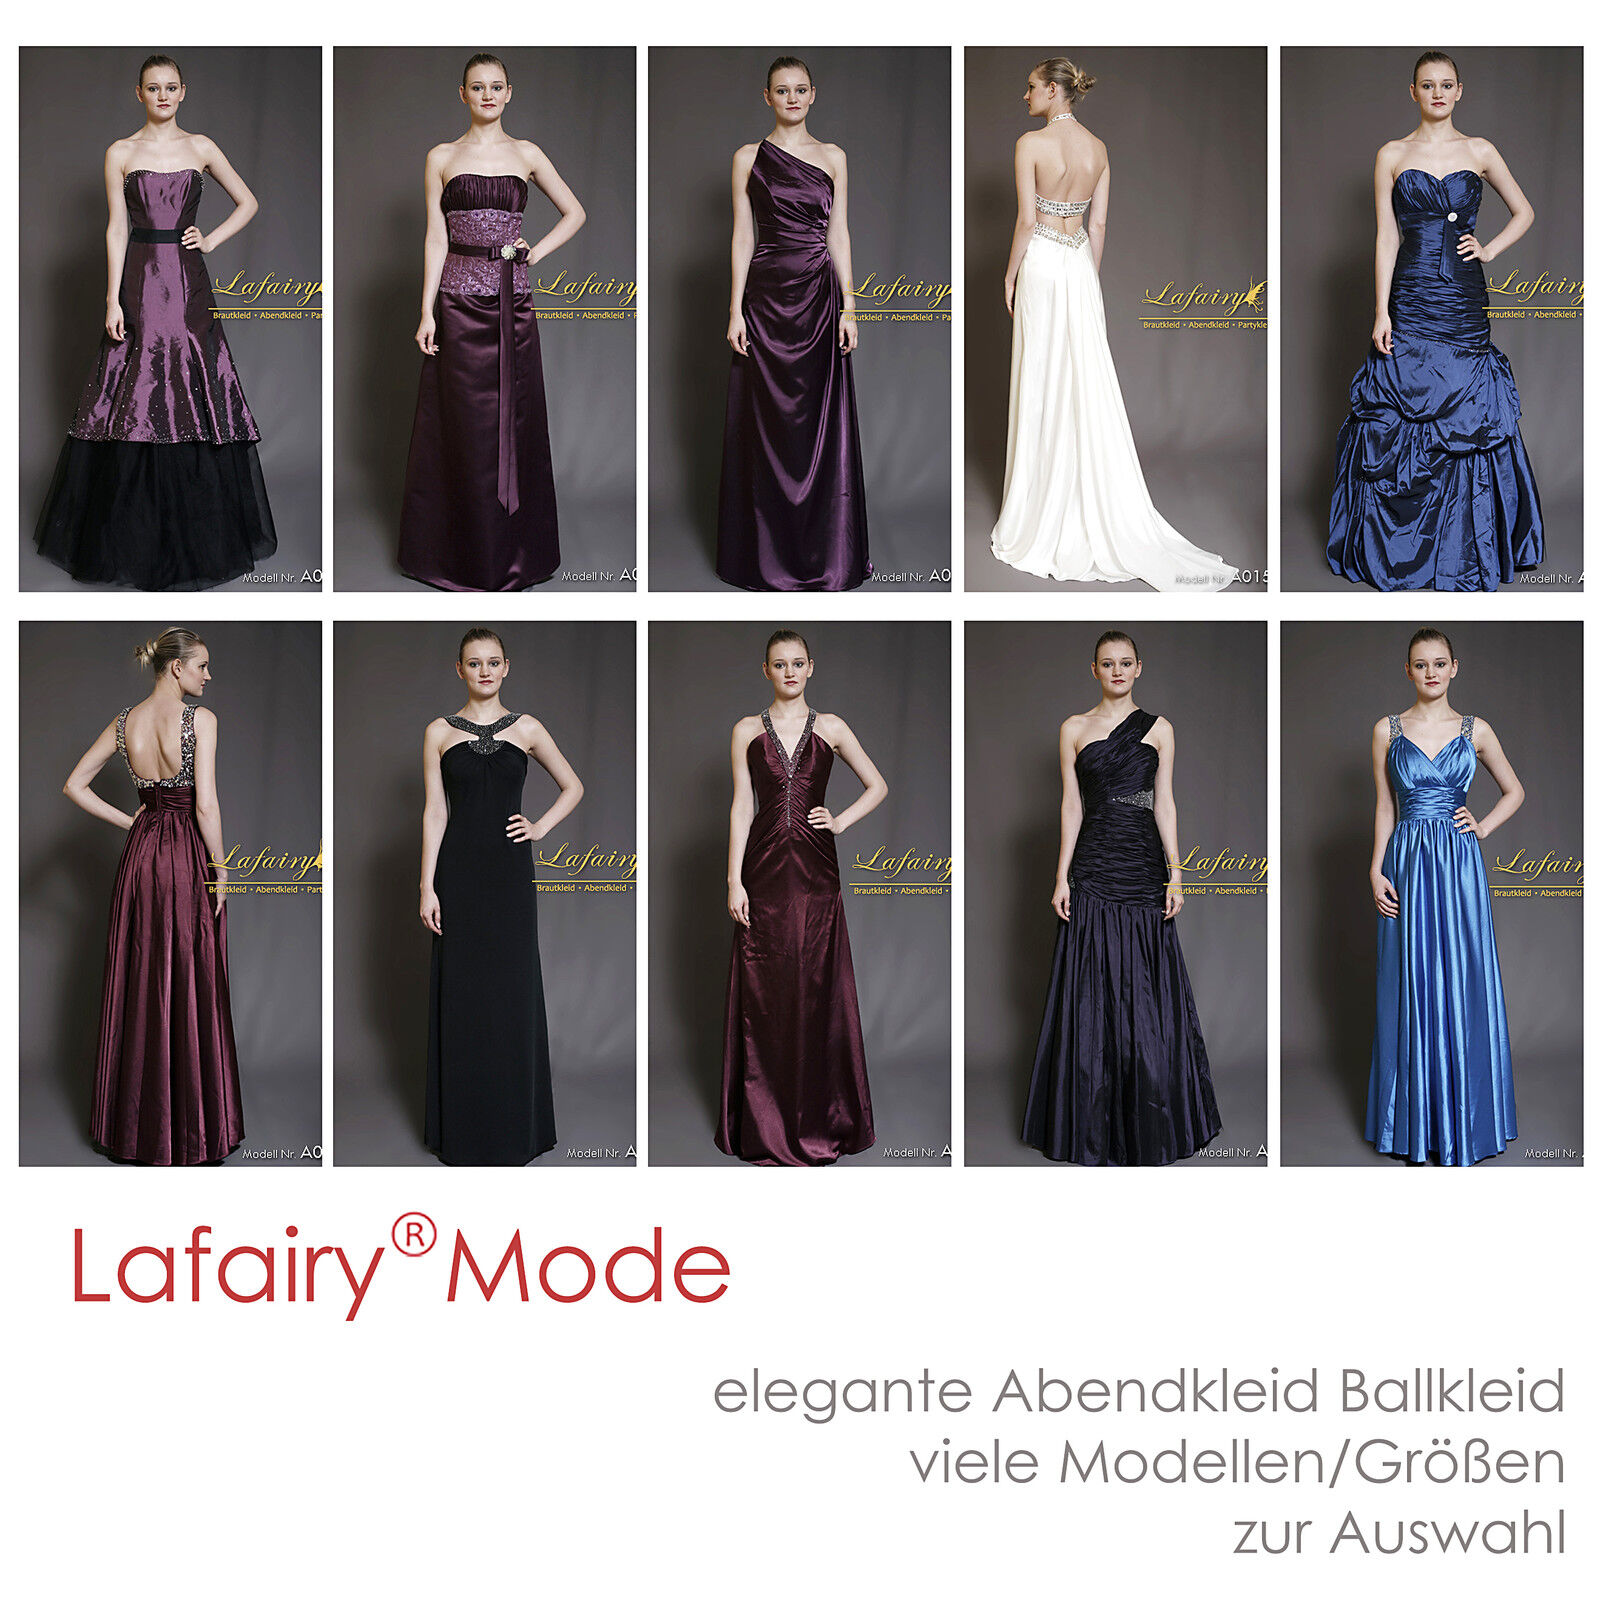 Abendkleider Cocktailkleid Ballkleid bodenlang Ärmellos lila blau weiß Lafairy